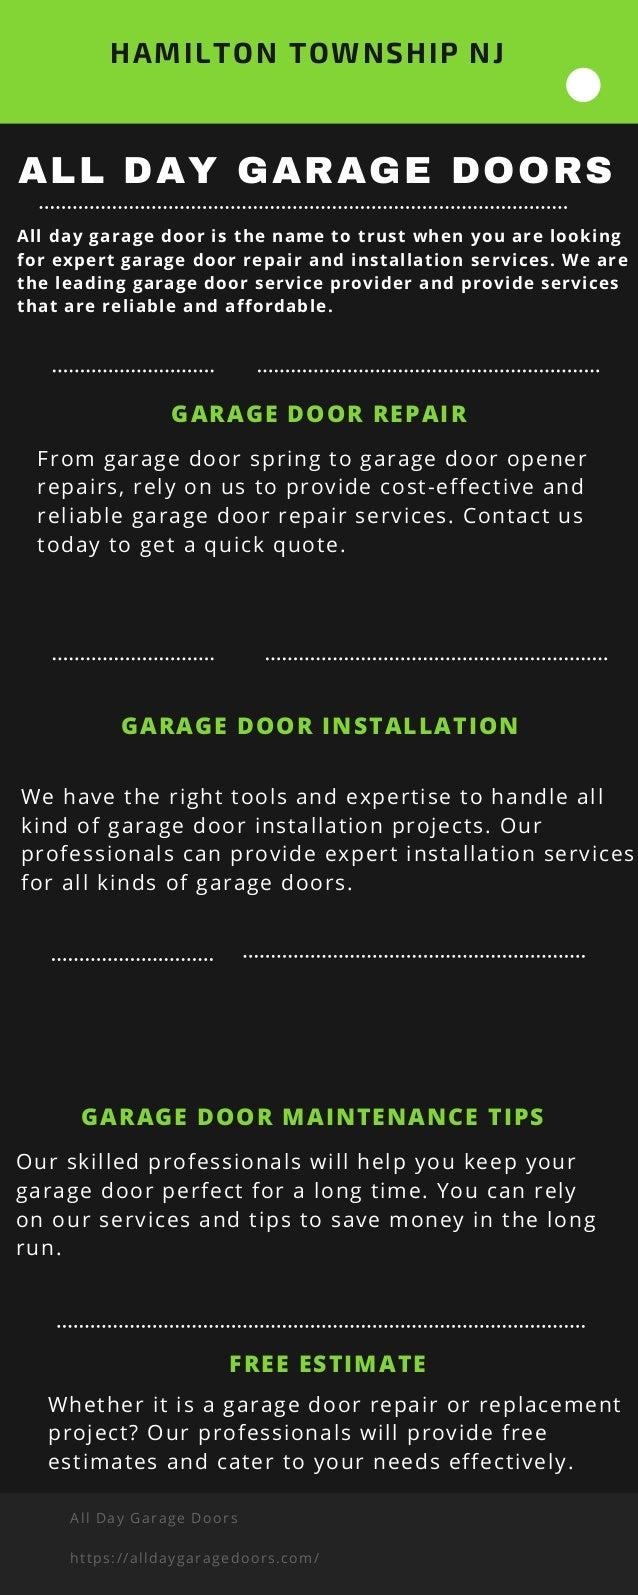 All Day Garage Doors Hamilton Township Nj